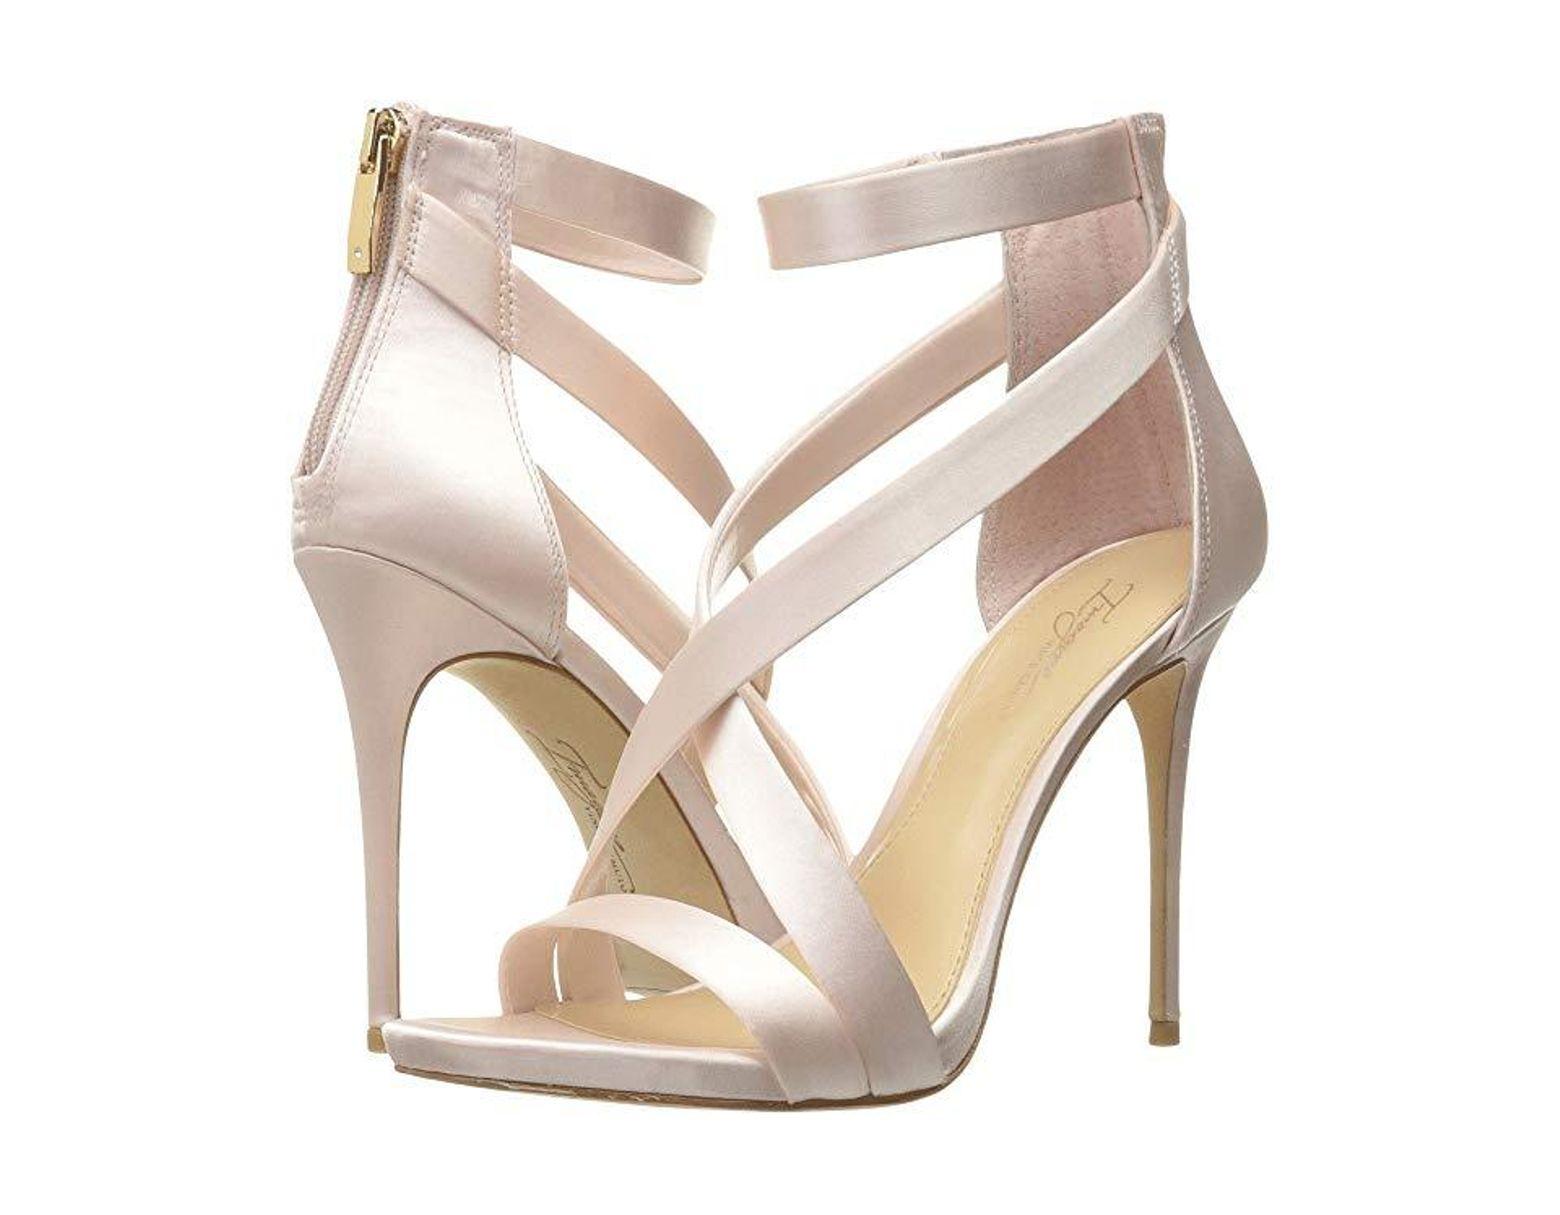 074f412c6 Vince Camuto Imagine Devin High Heel Dress Sandals in Metallic - Save 8% -  Lyst